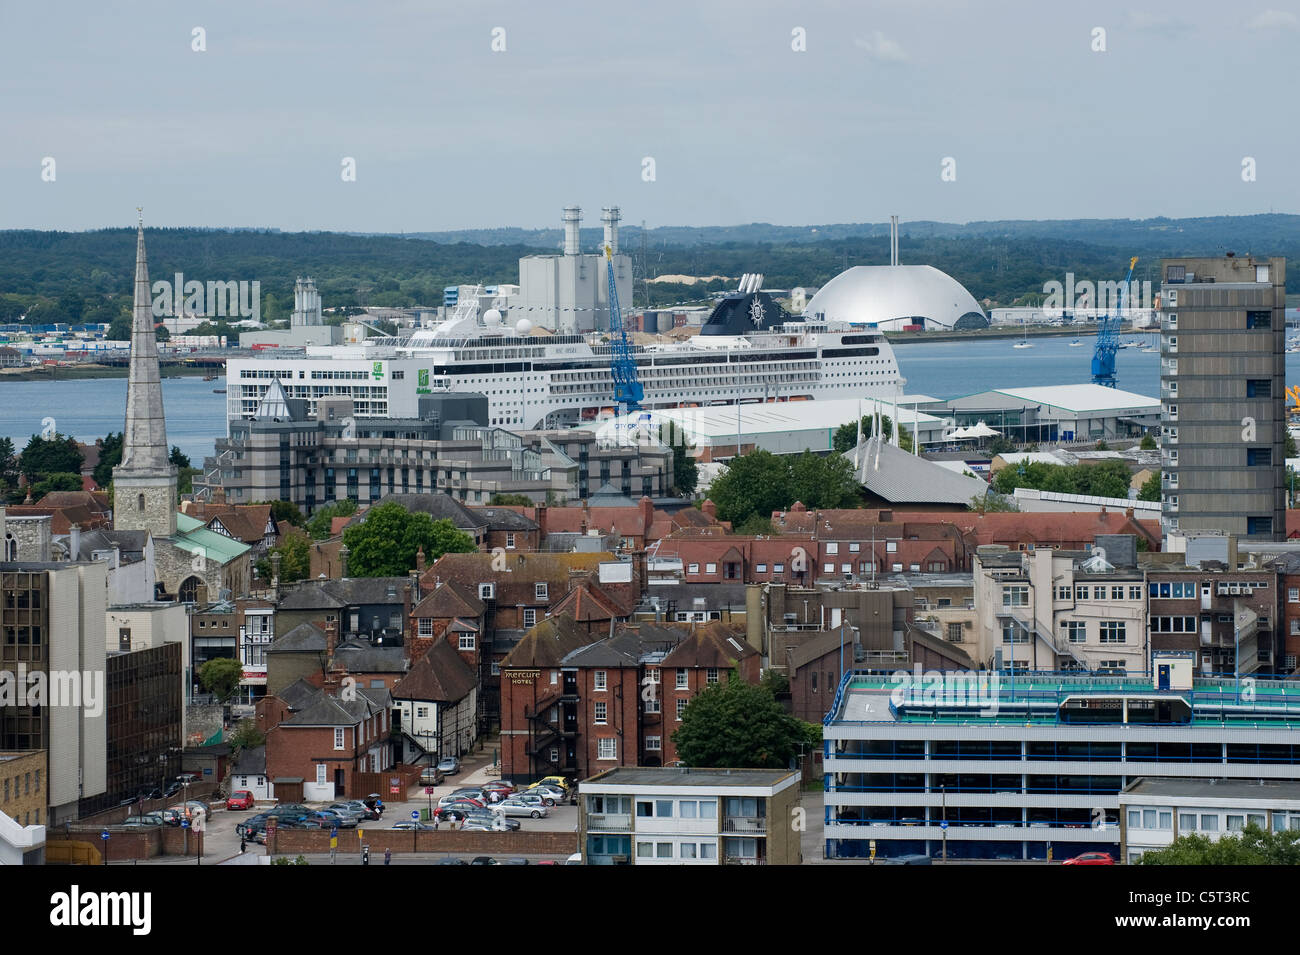 Southampton City centre, England - rooftop view - Stock Image